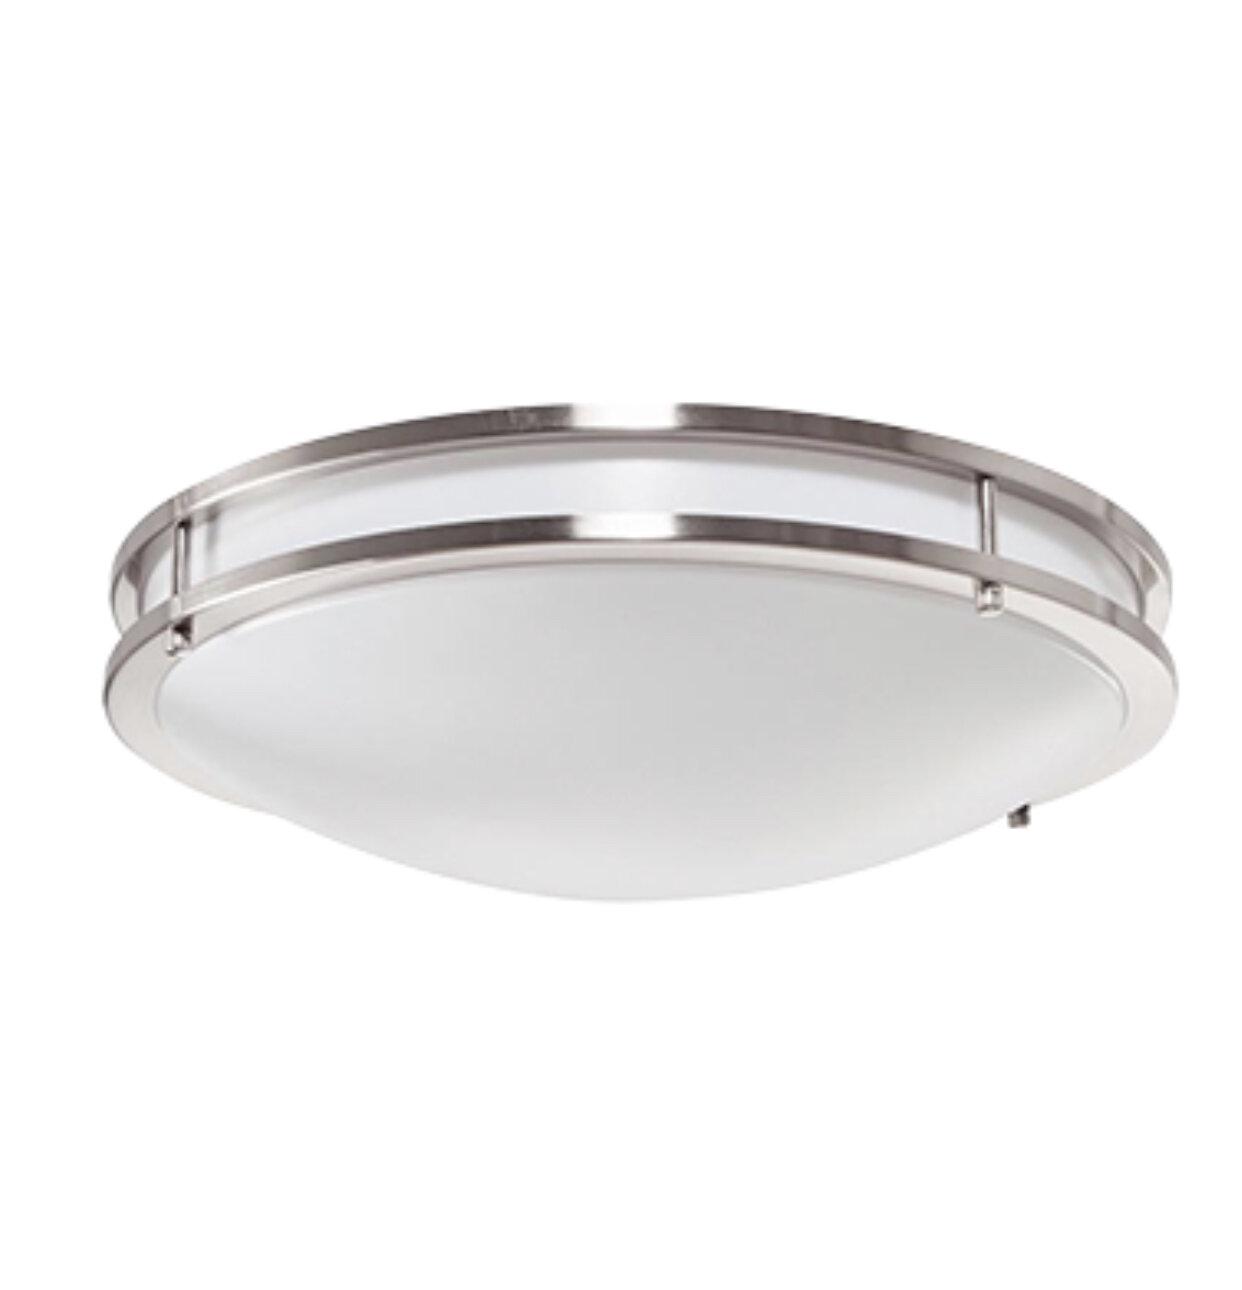 17W LED Satin Nickel Ringed Ceiling Light